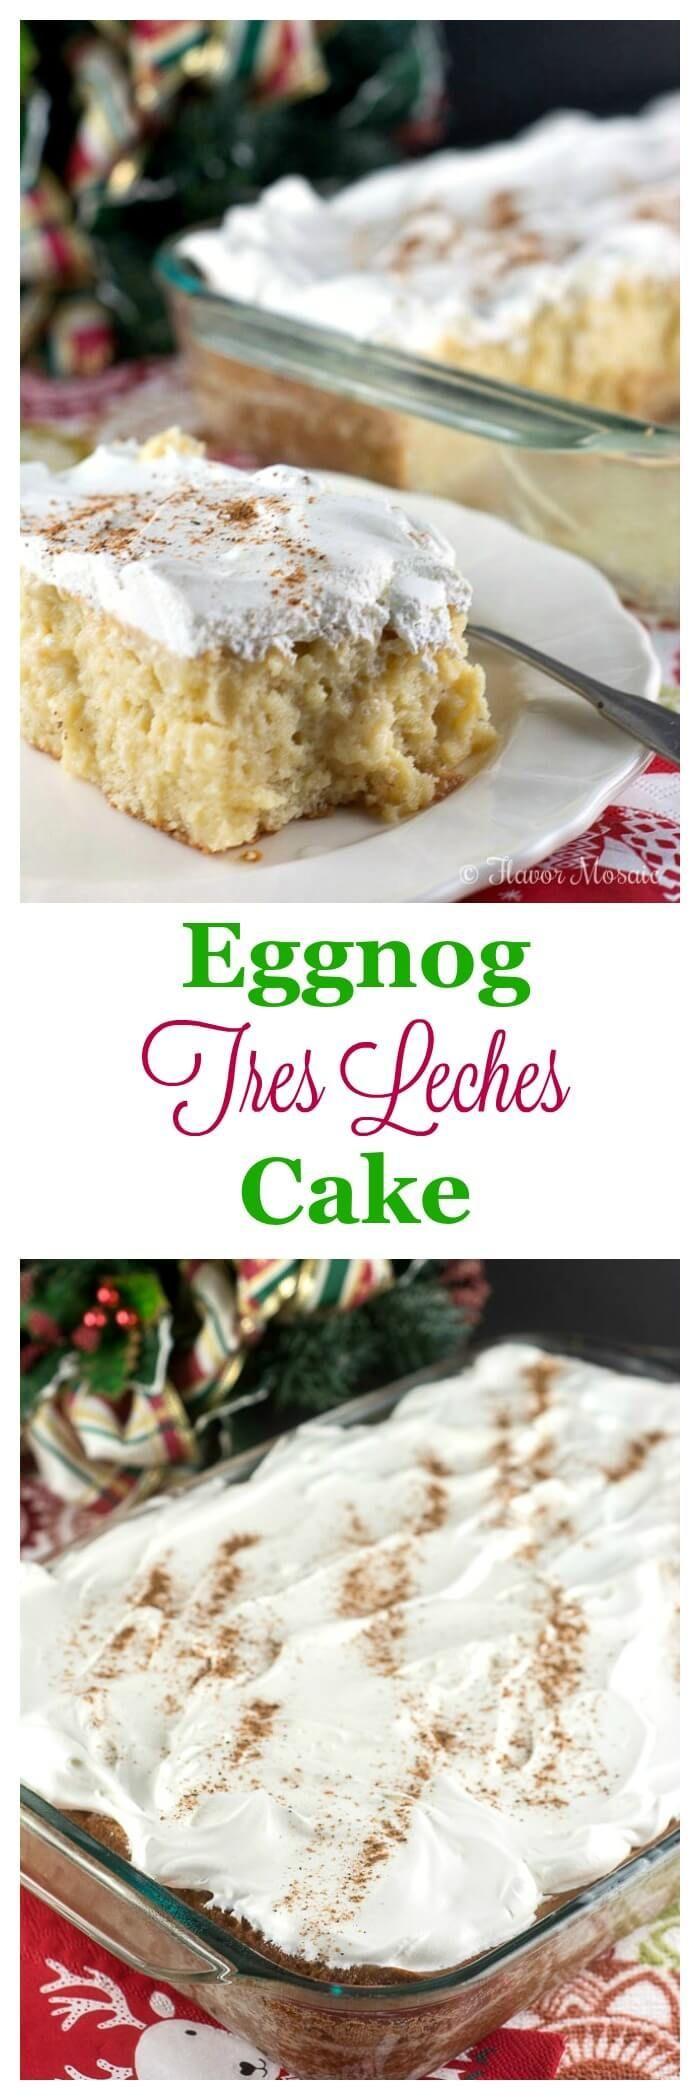 This sweet, moist, rich Eggnog Tres Leches Cake recipe makes a unique ...